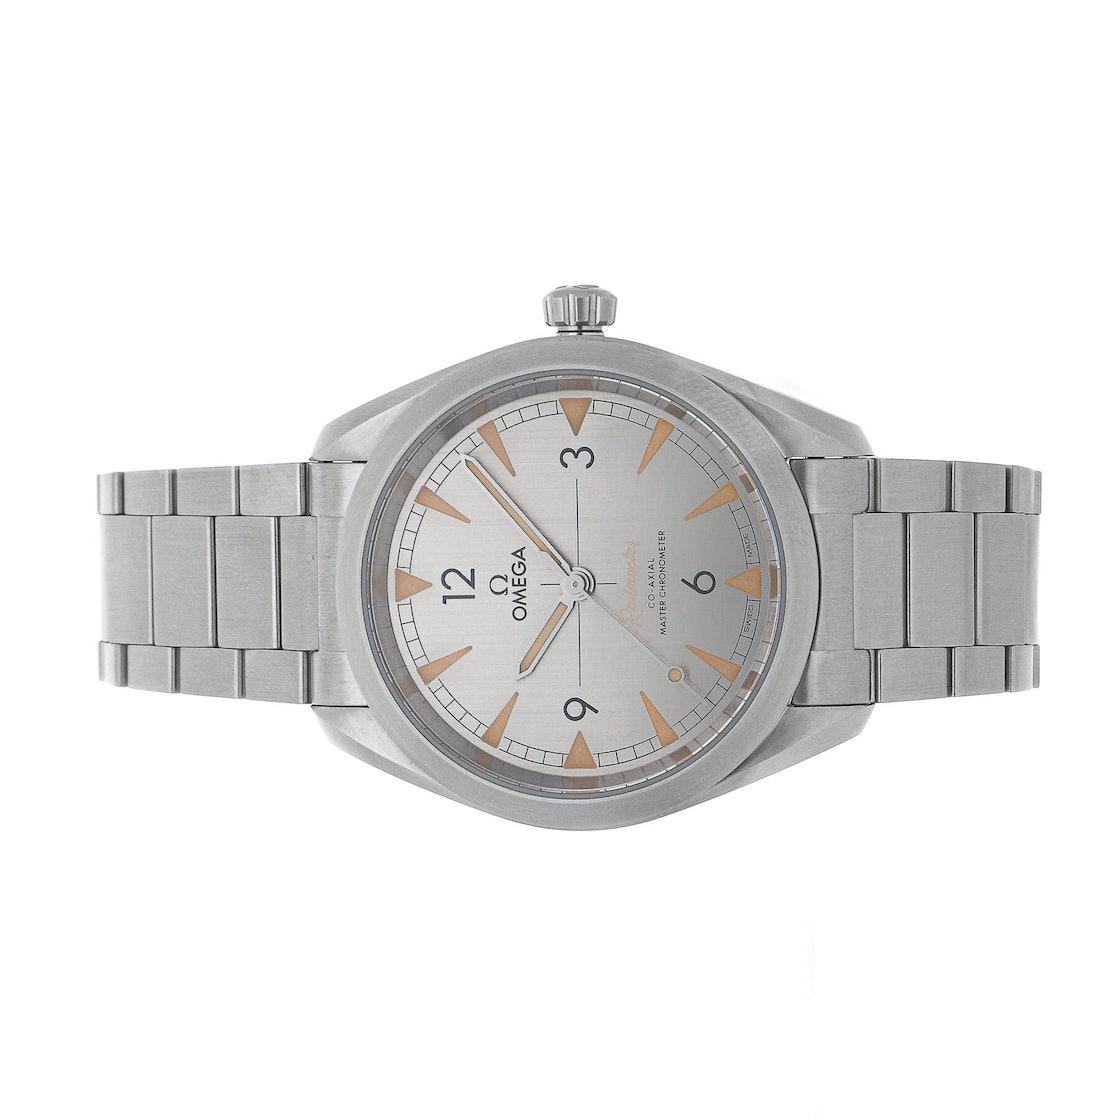 Omega Seamaster Railmaster Co-Axial Master Chronometer 220.10.40.20.06.001